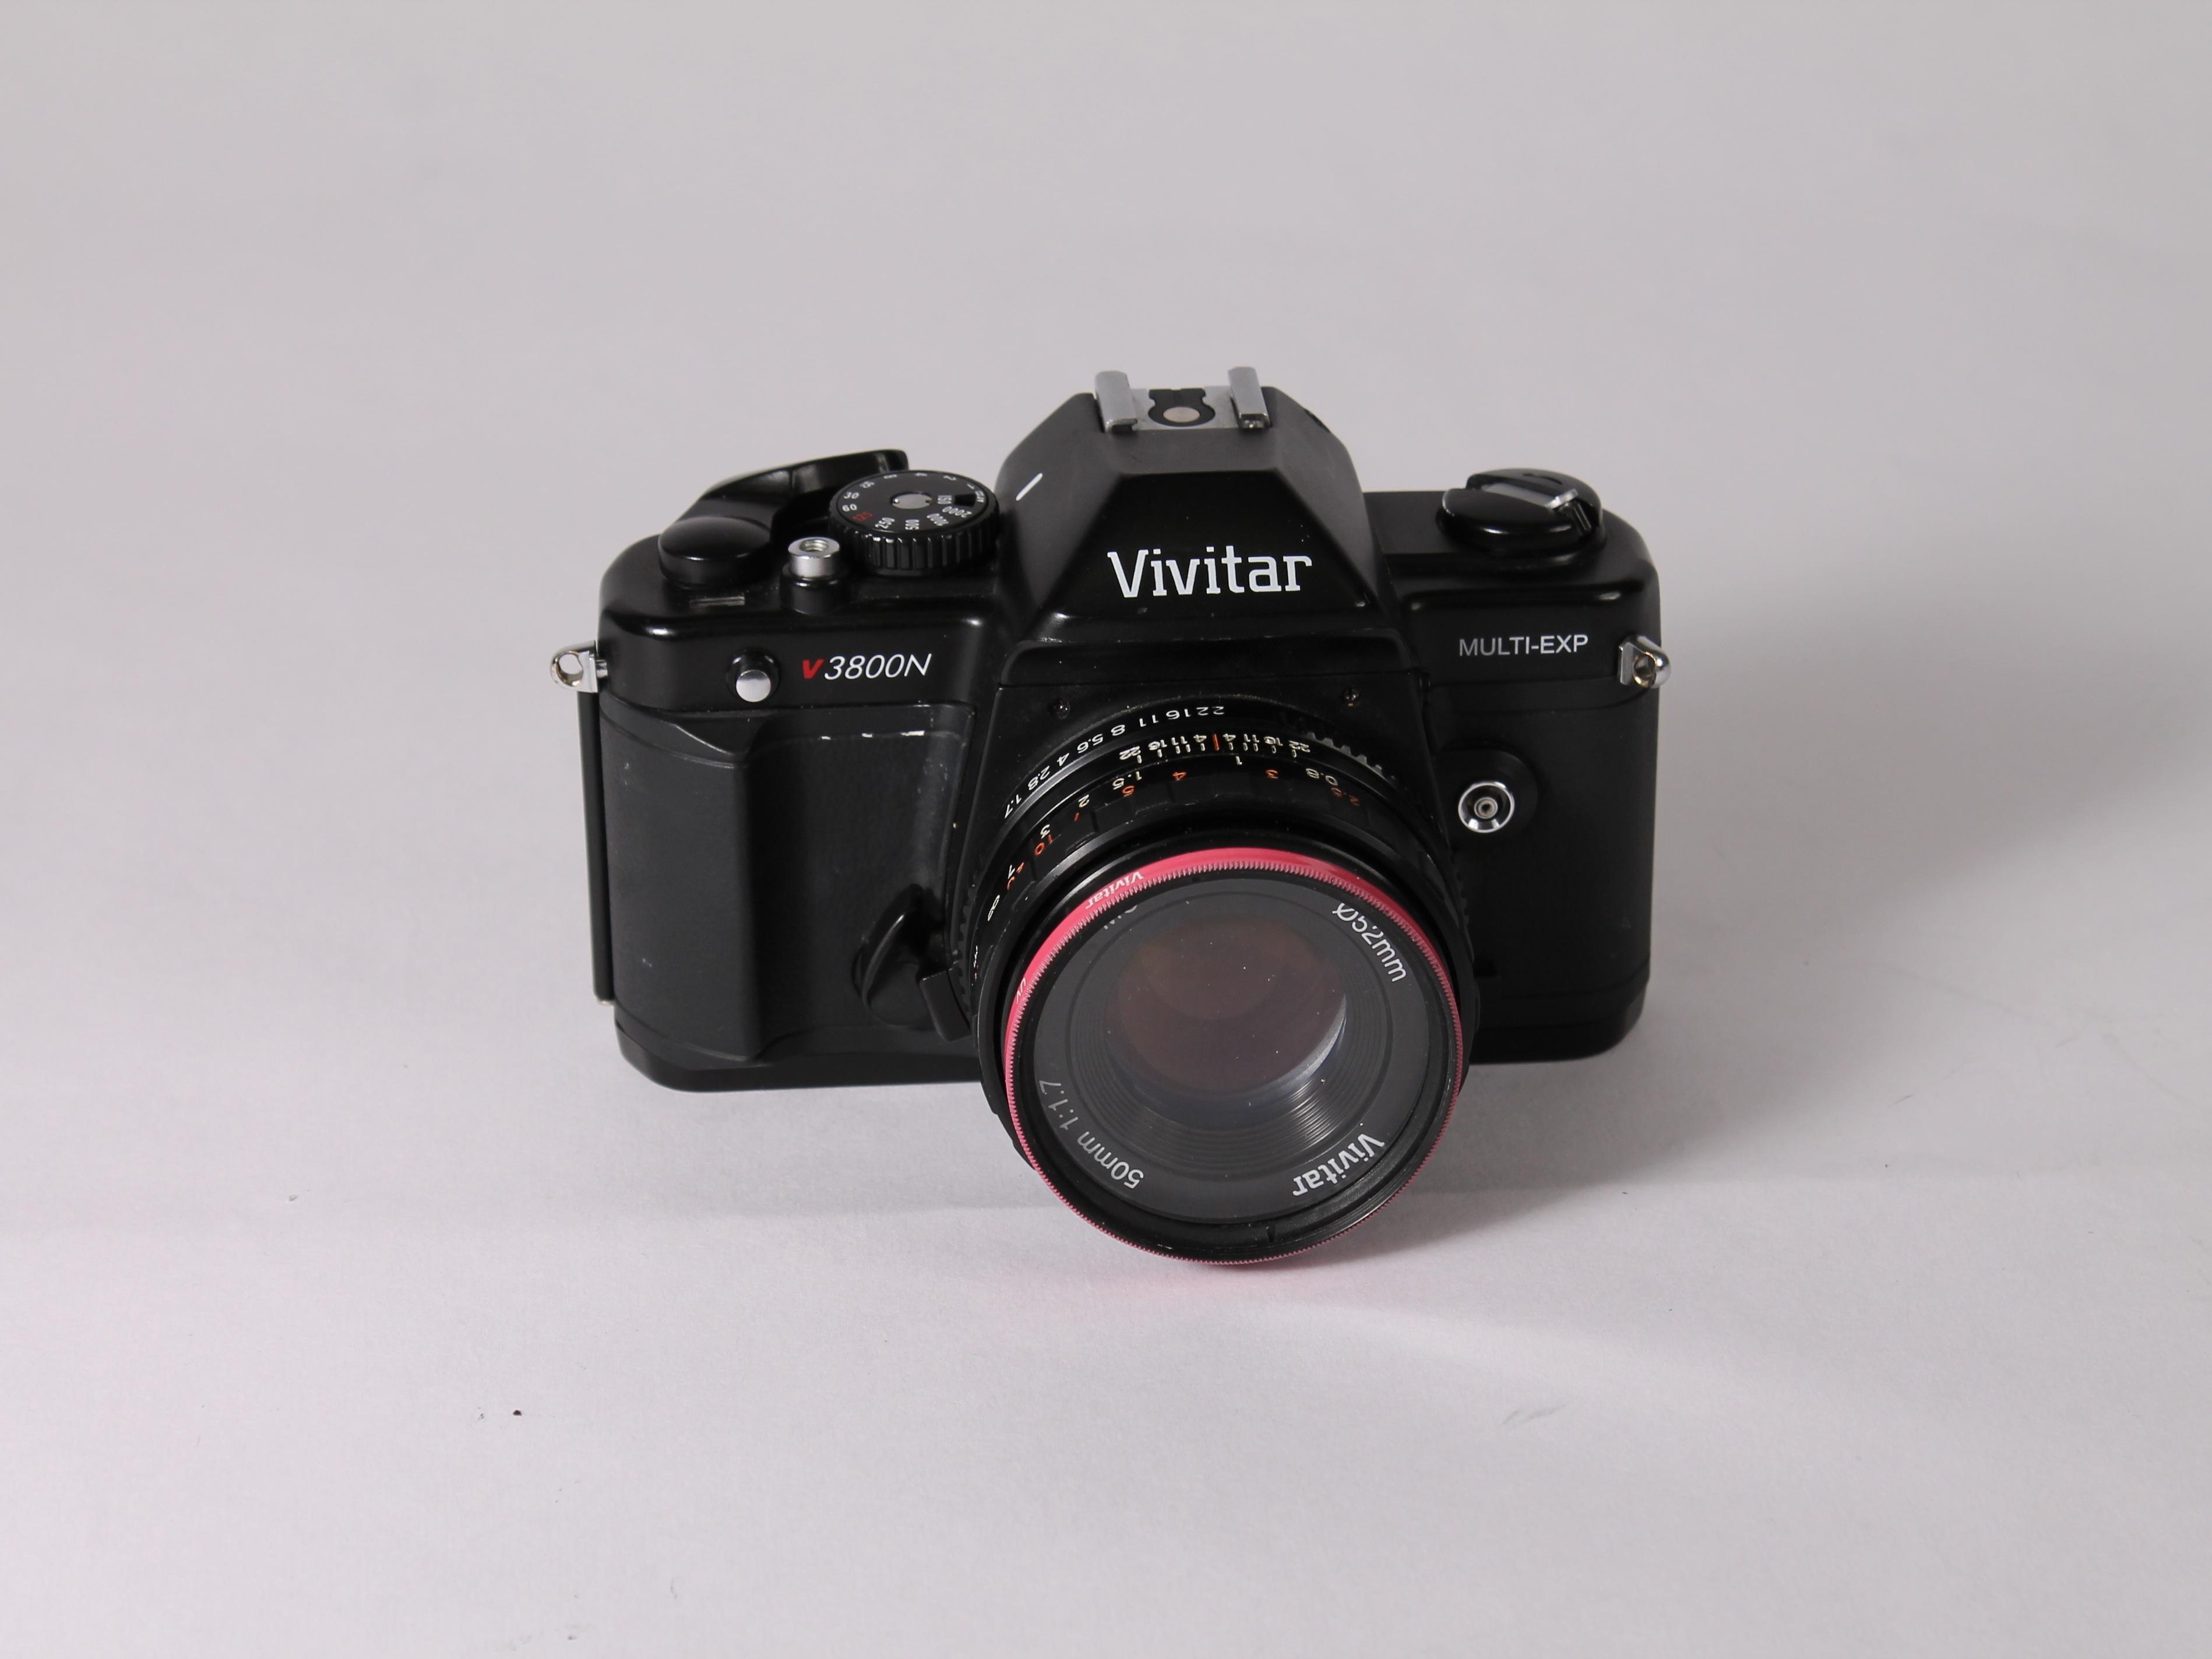 vivitar v3800n camera frame counter replacement ifixit repair guide rh ifixit com Vivitar V3800N Review Vivitar SLR 35Mm Camera